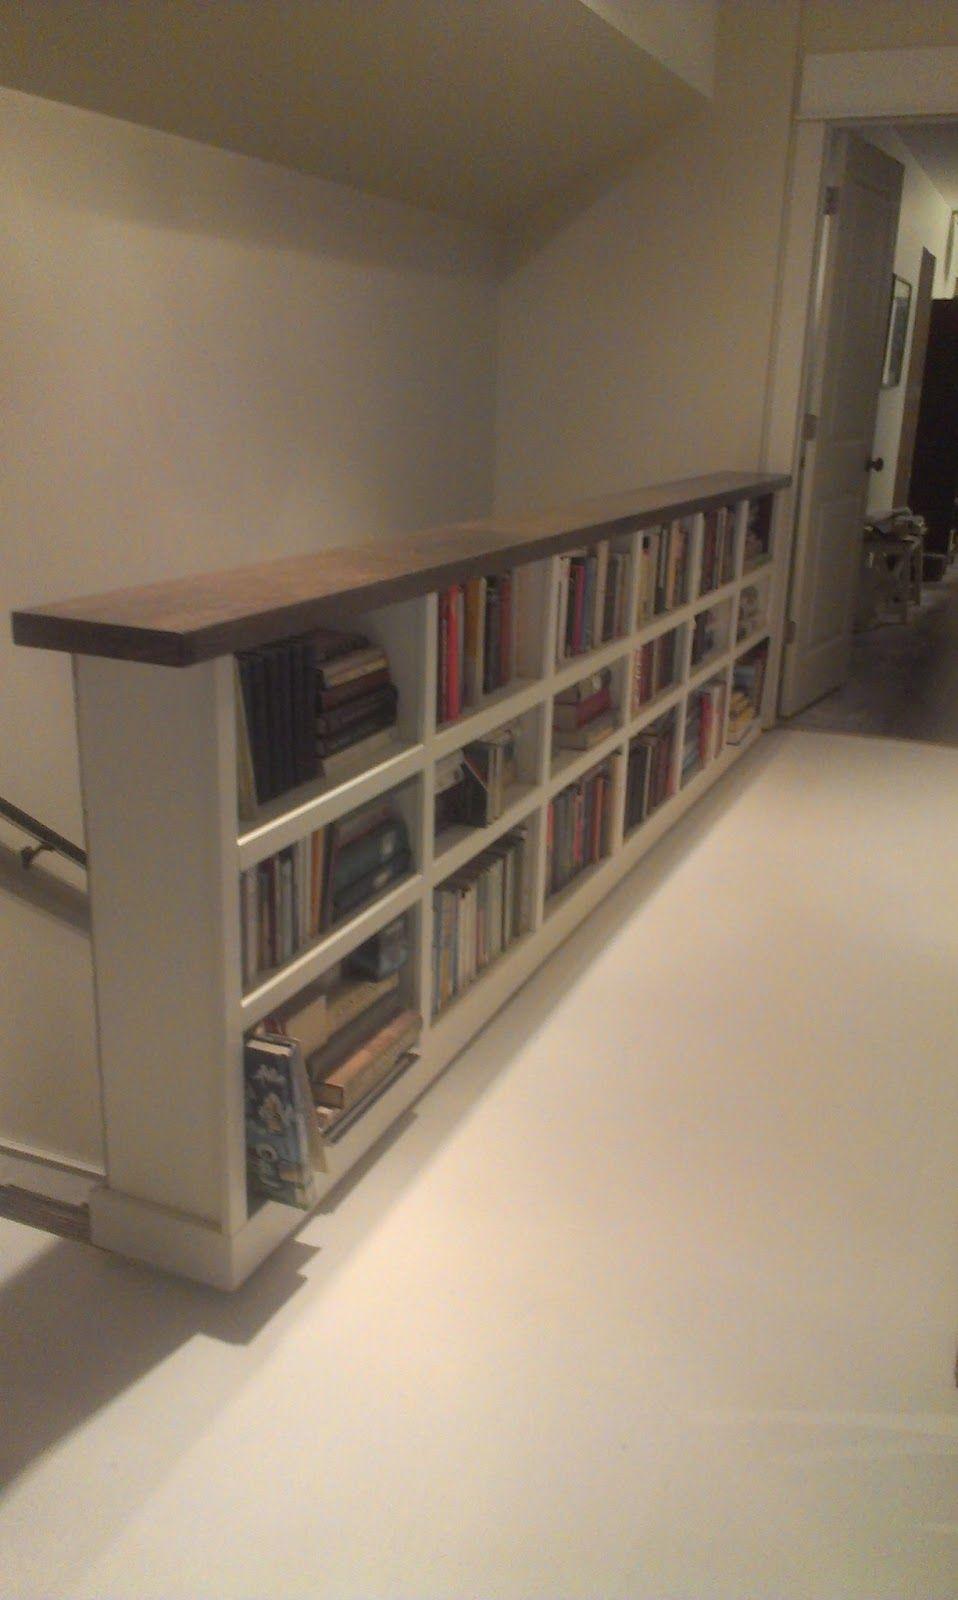 b cherregal treppen br stung wohnen flur treppenhaus in 2018 pinterest treppe haus. Black Bedroom Furniture Sets. Home Design Ideas